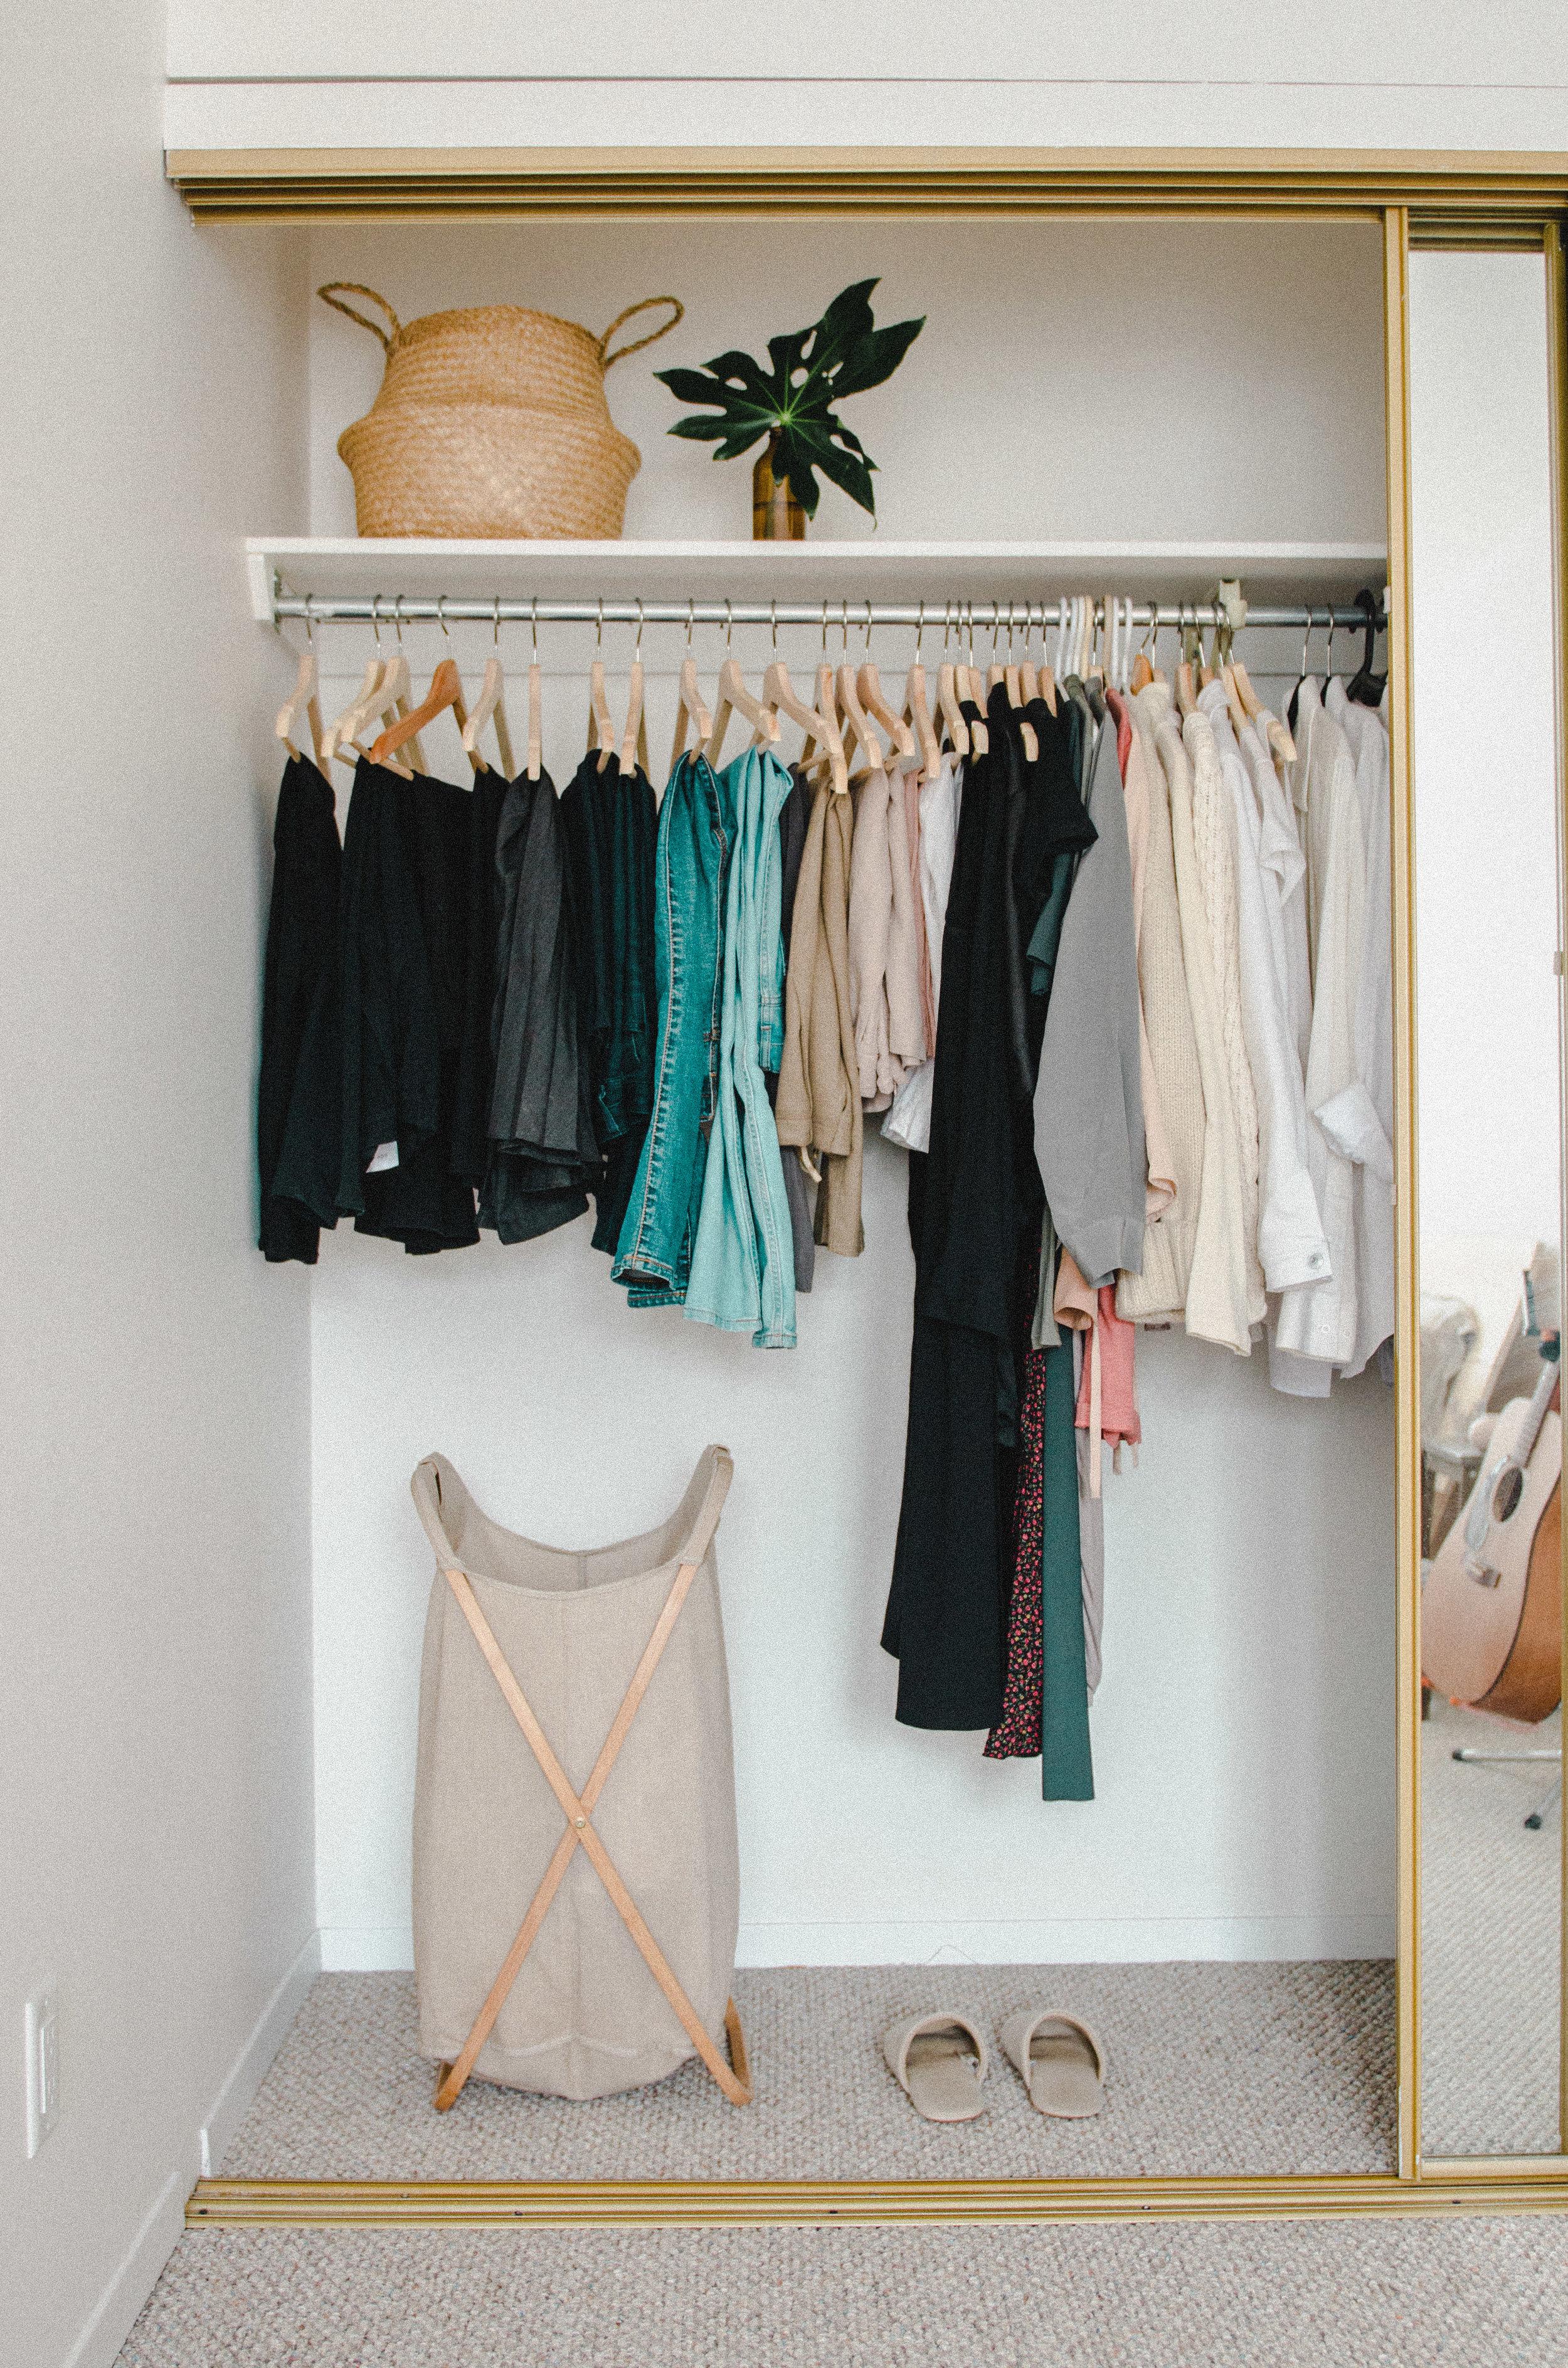 Closet-8629.jpg